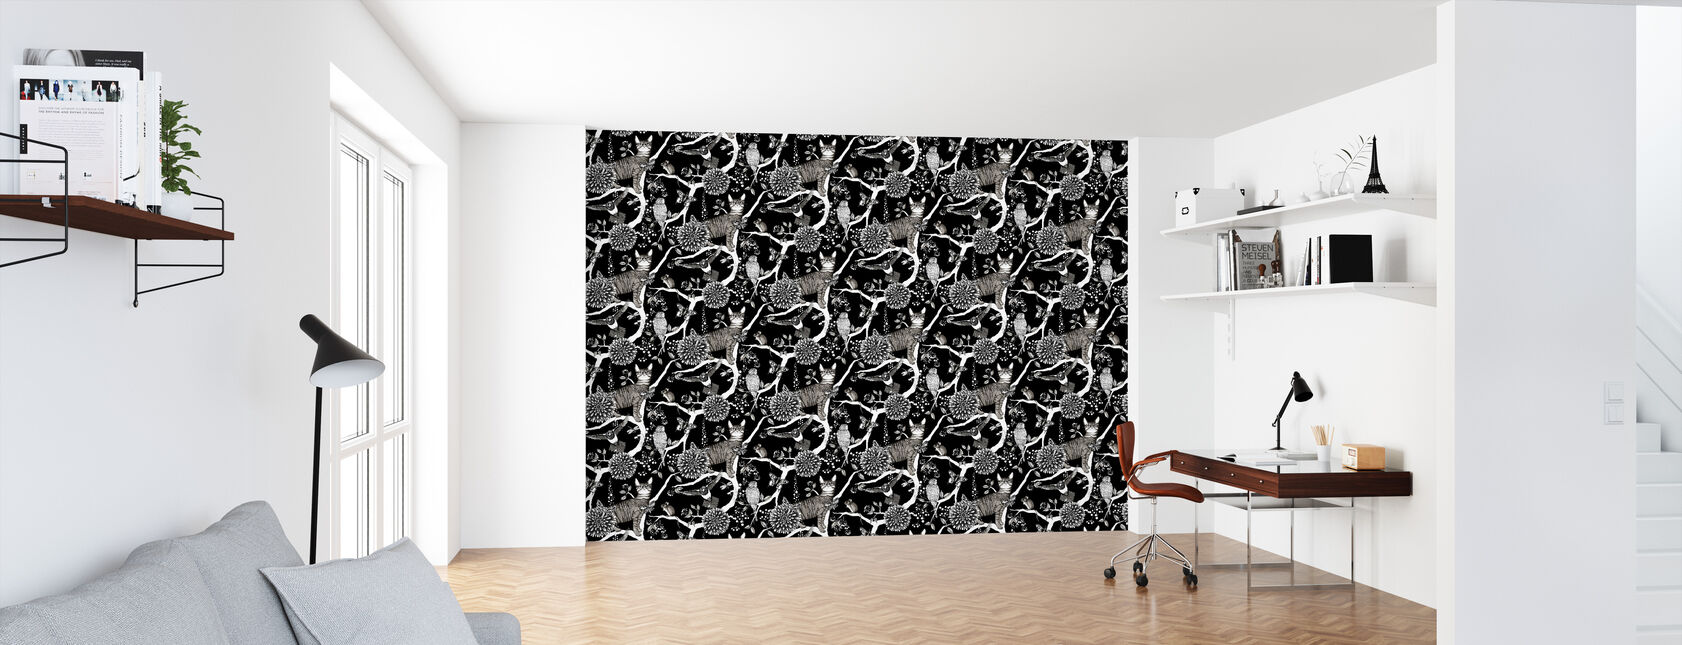 Catzy - Wallpaper - Office